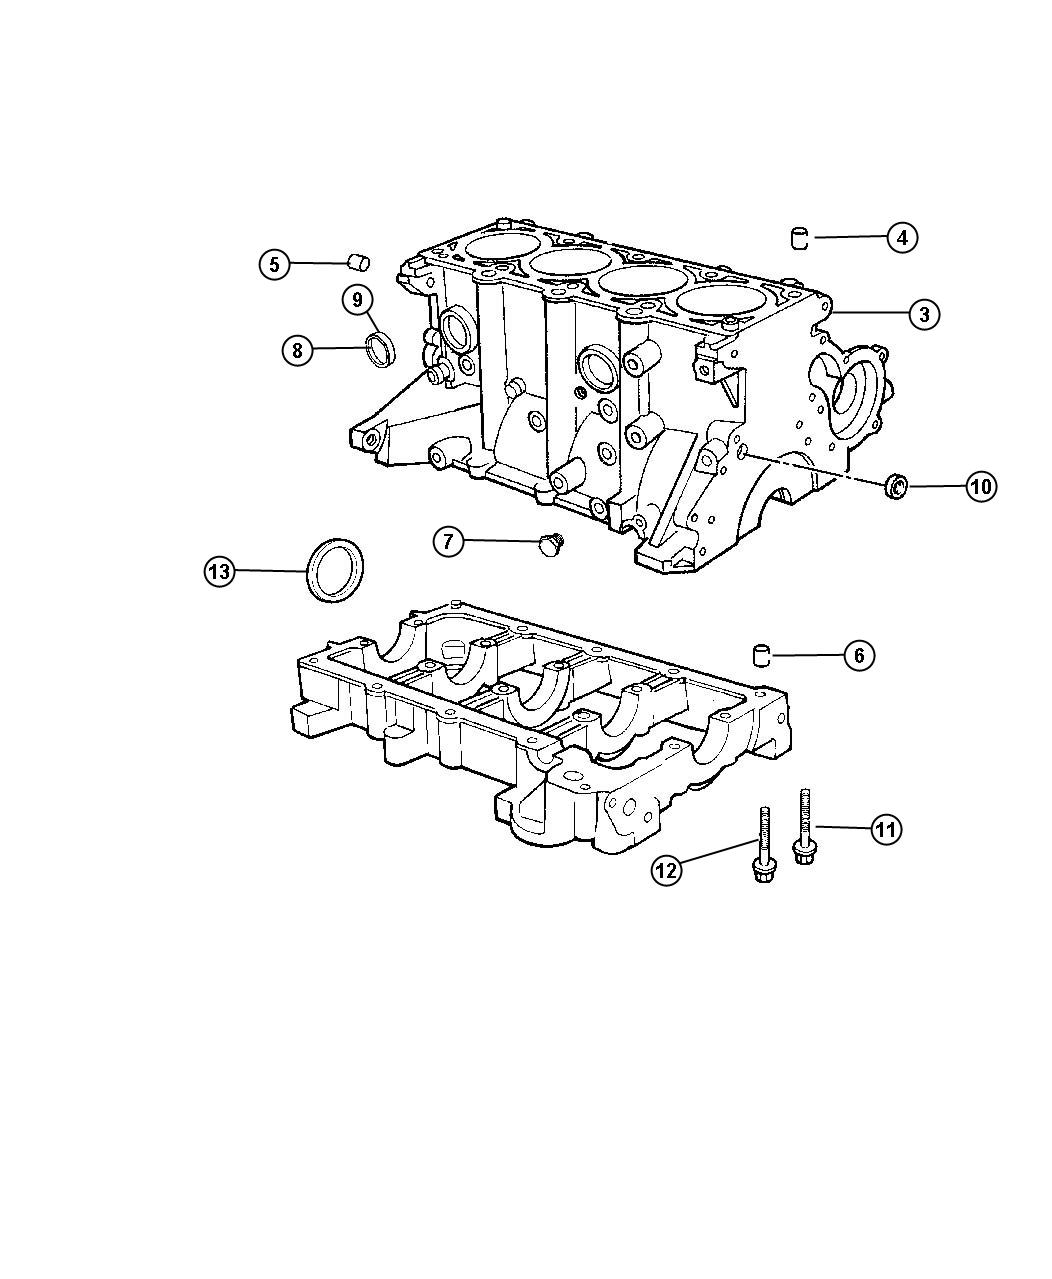 Diagram Hyundai Dohc 16v Engine Diagram Full Version Hd